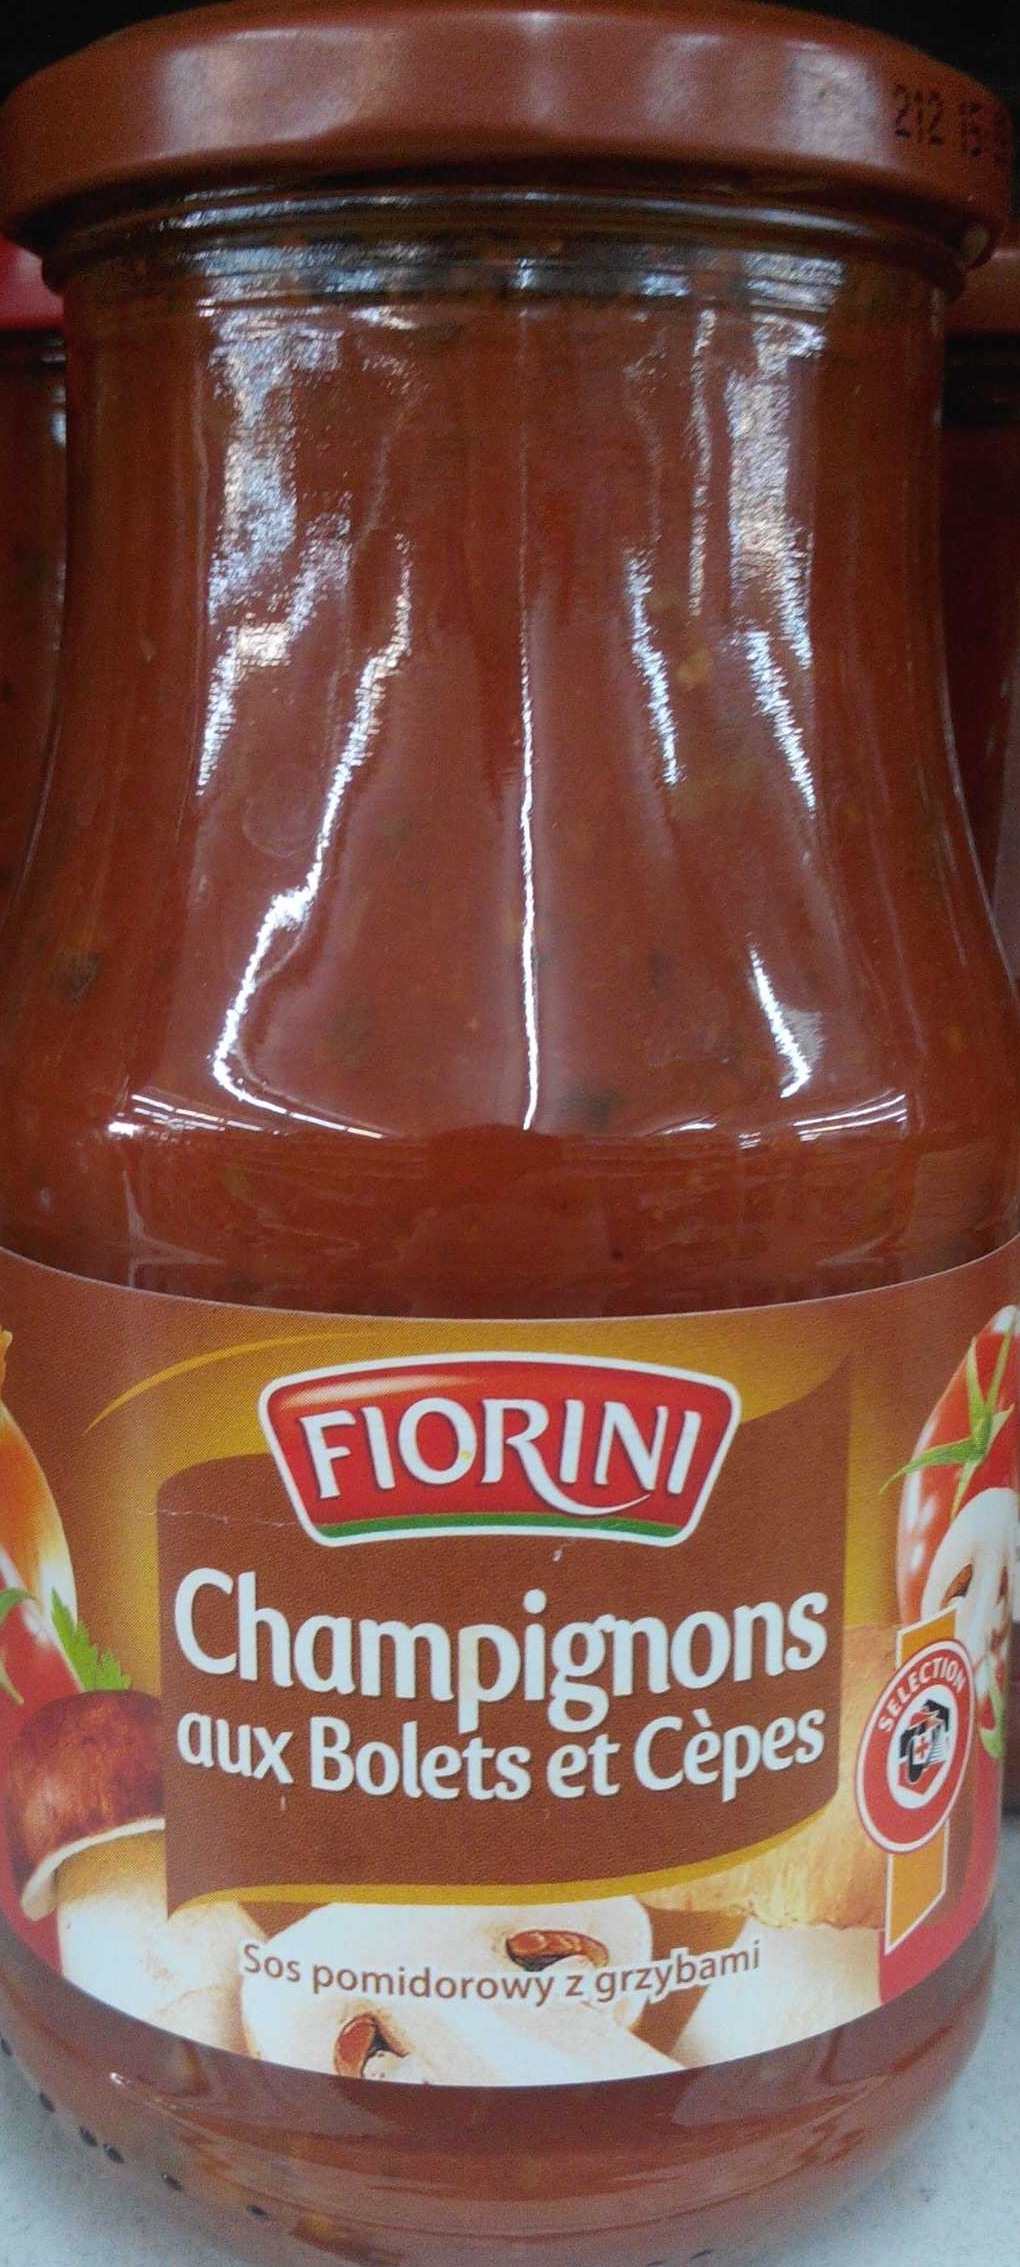 Champignons Bolets & Cèpes - Product - fr